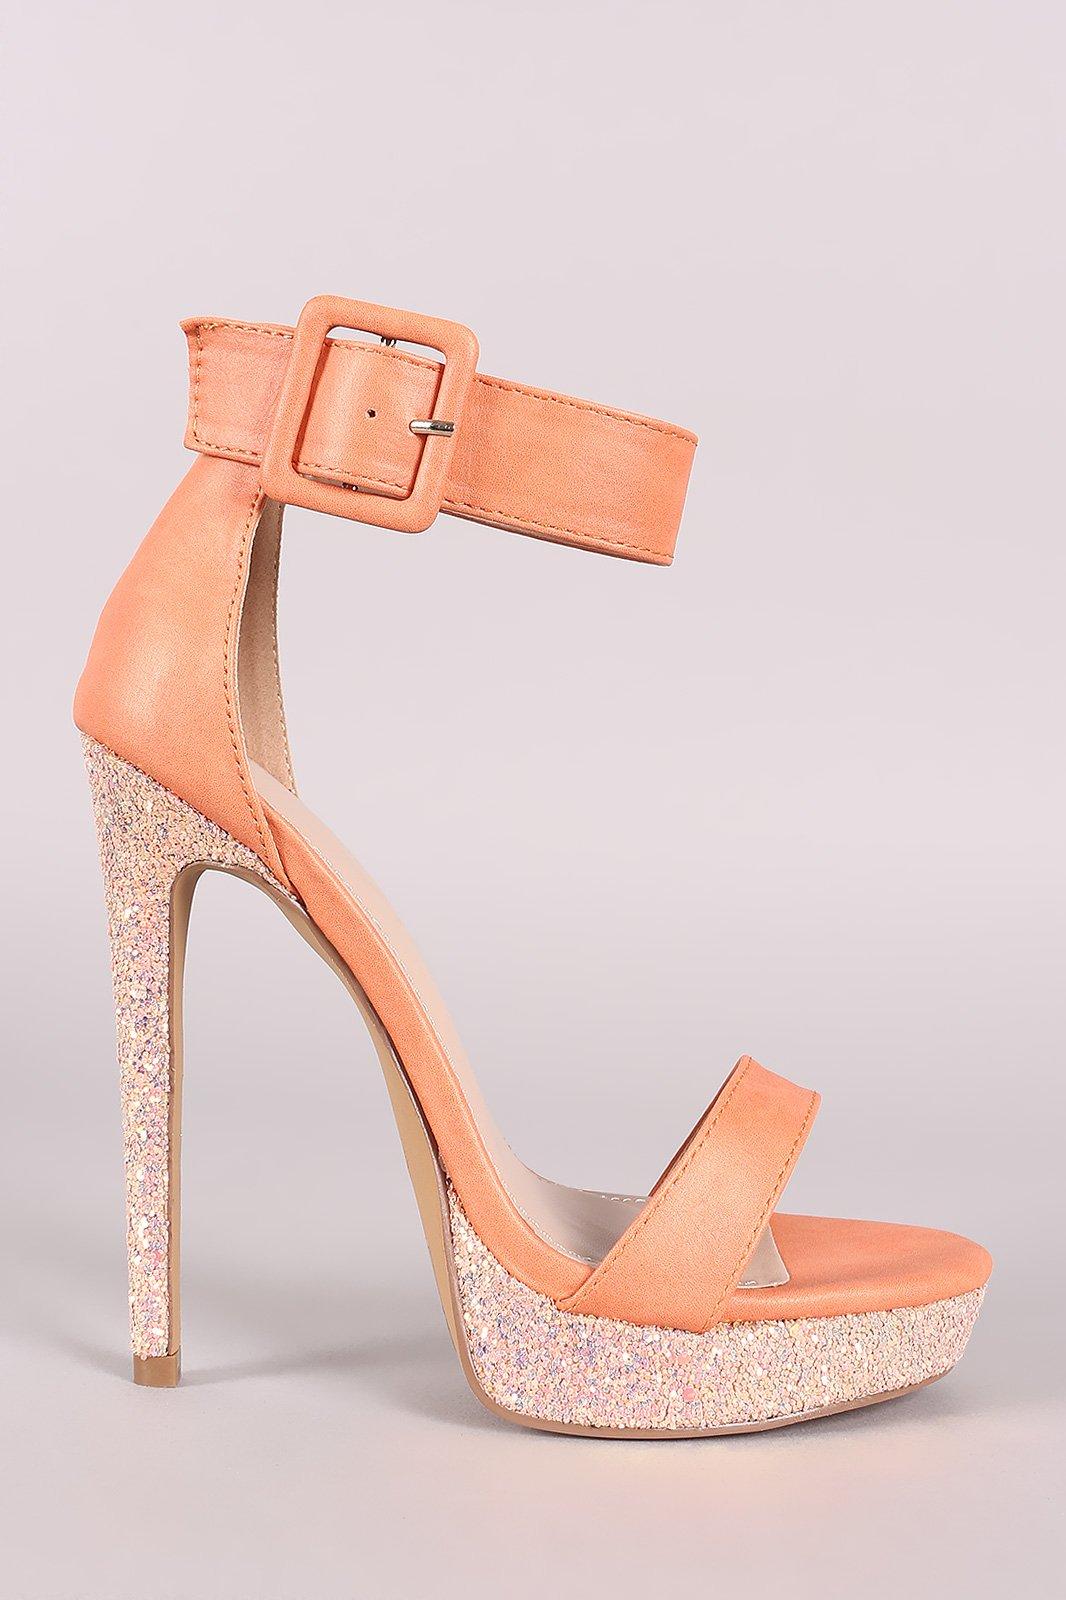 0e7177d4cd9 Shoe Republic LA Buckled Ankle Strap Glitter Platform Heel ...